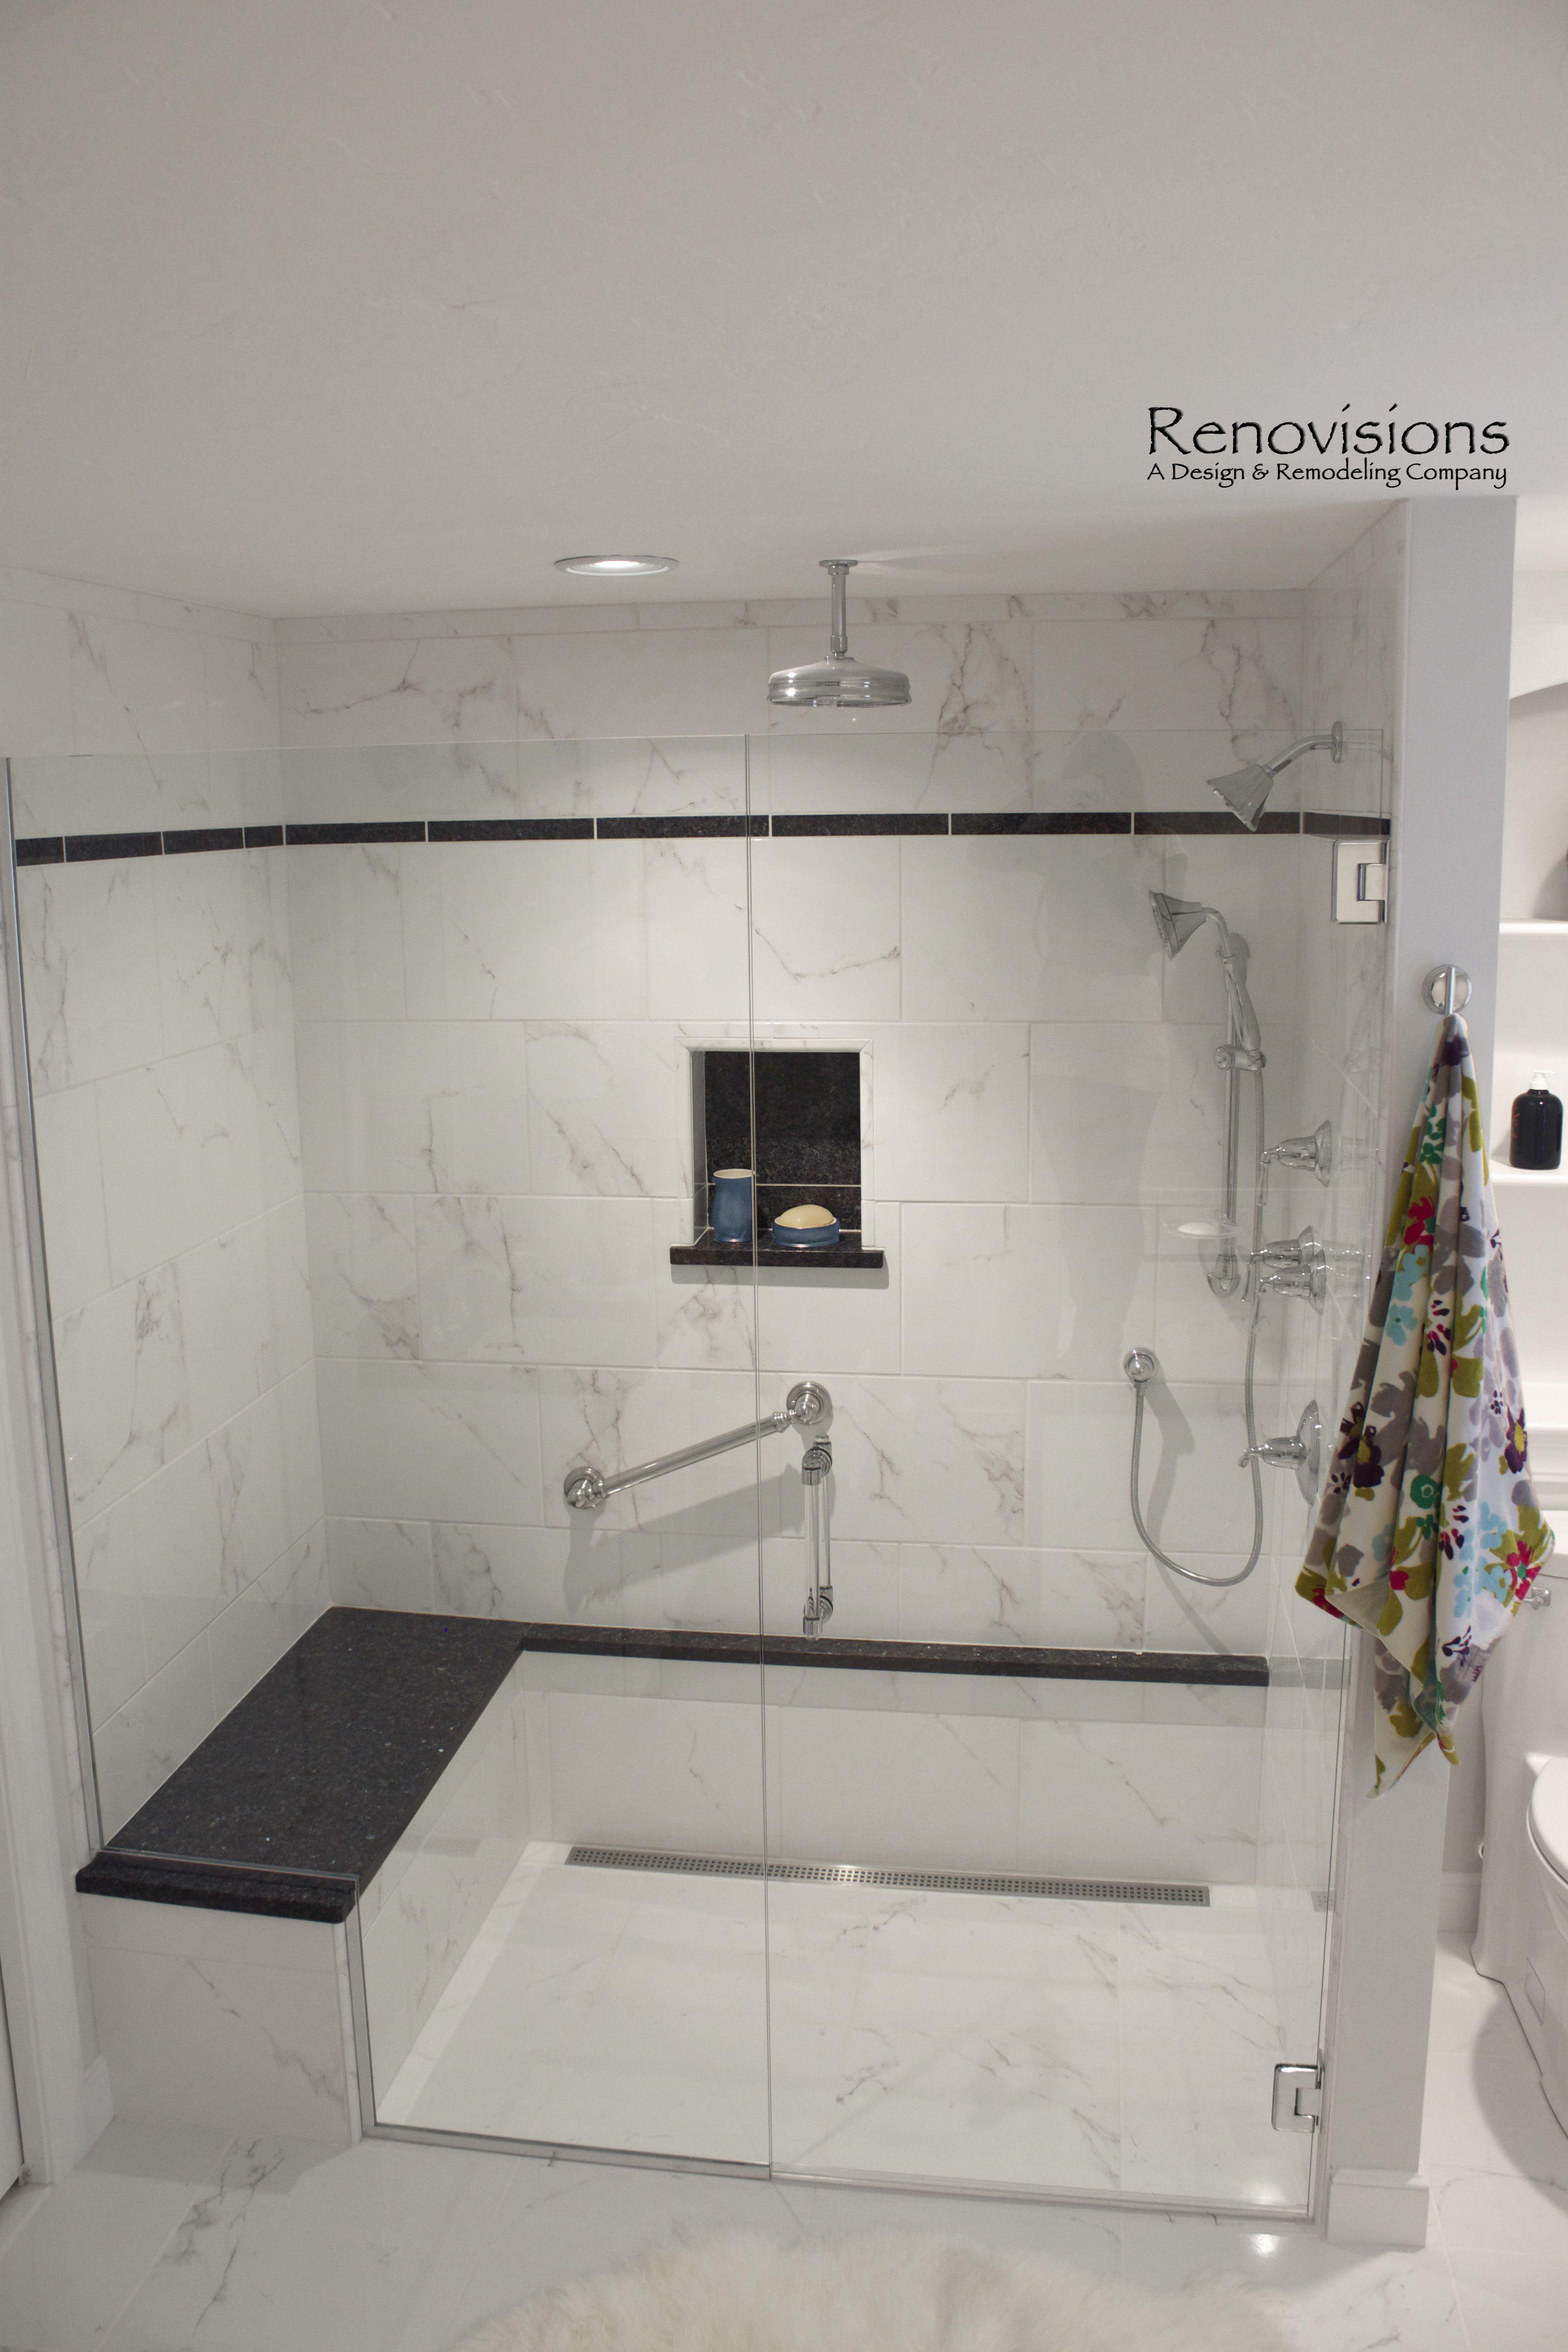 Master bath remodel by Renovisions. This spa-like environment ...